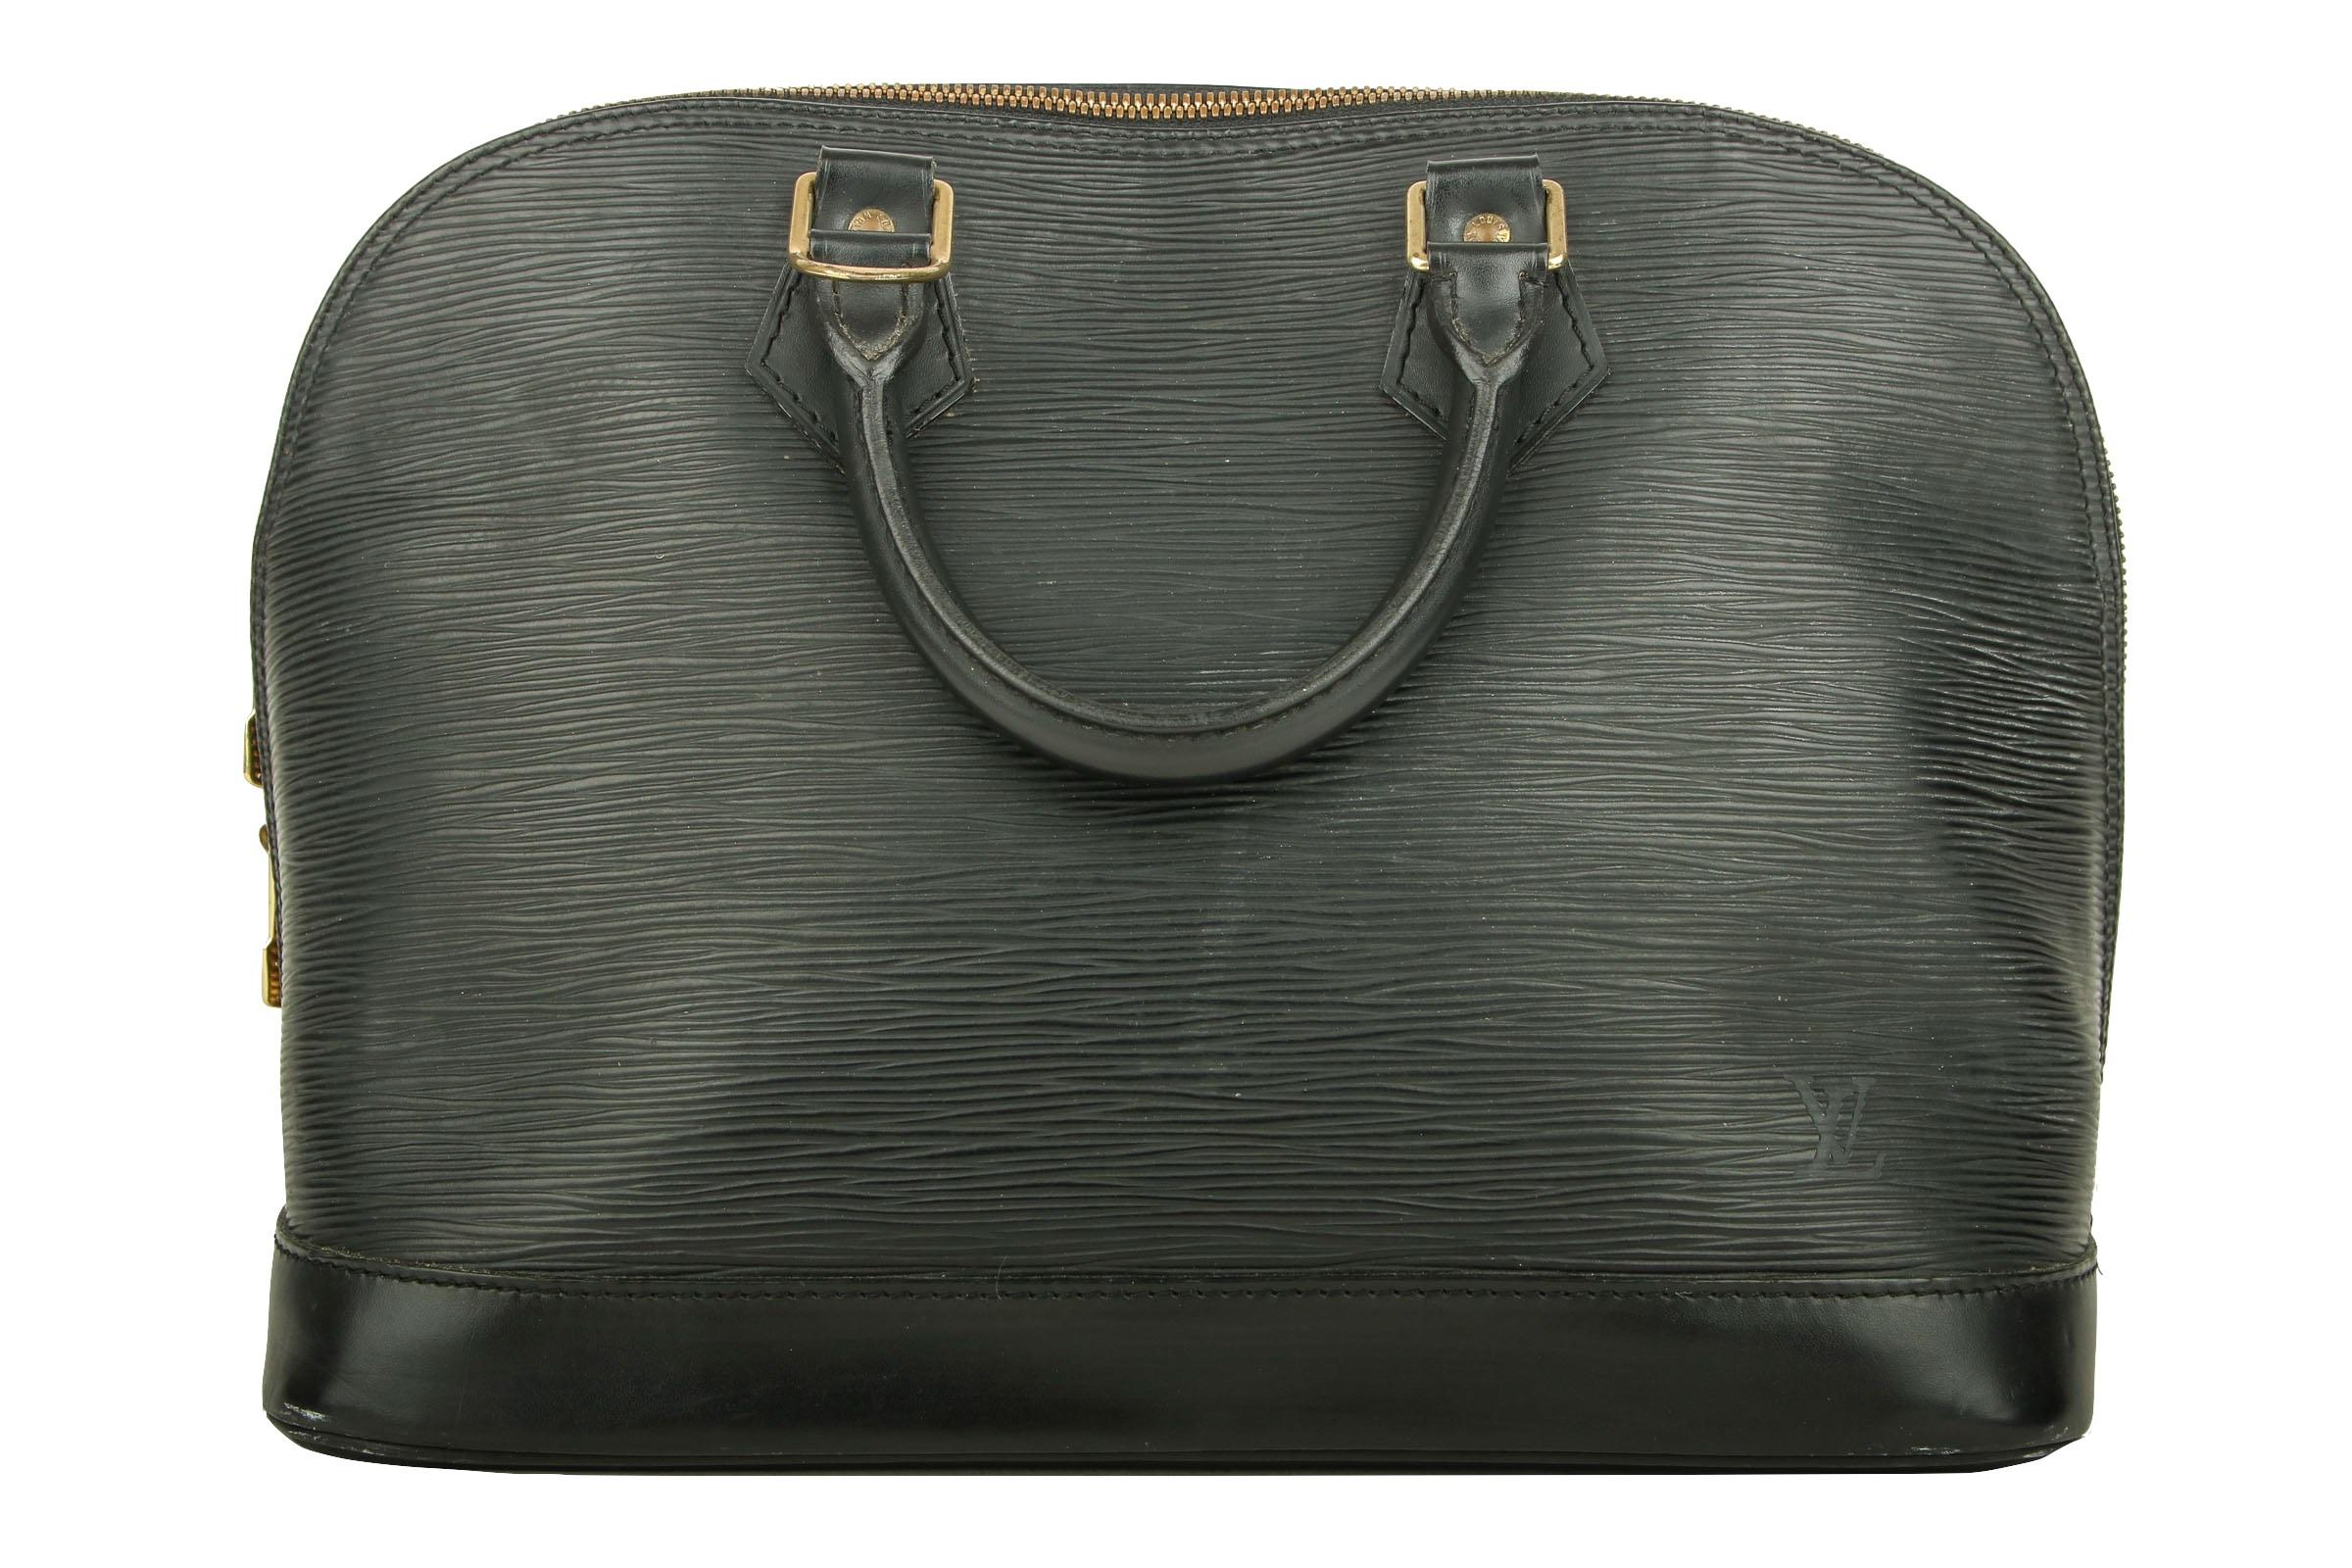 875dd571d3 Louis Vuitton Handtaschen & Accessoires | Luxussachen.com